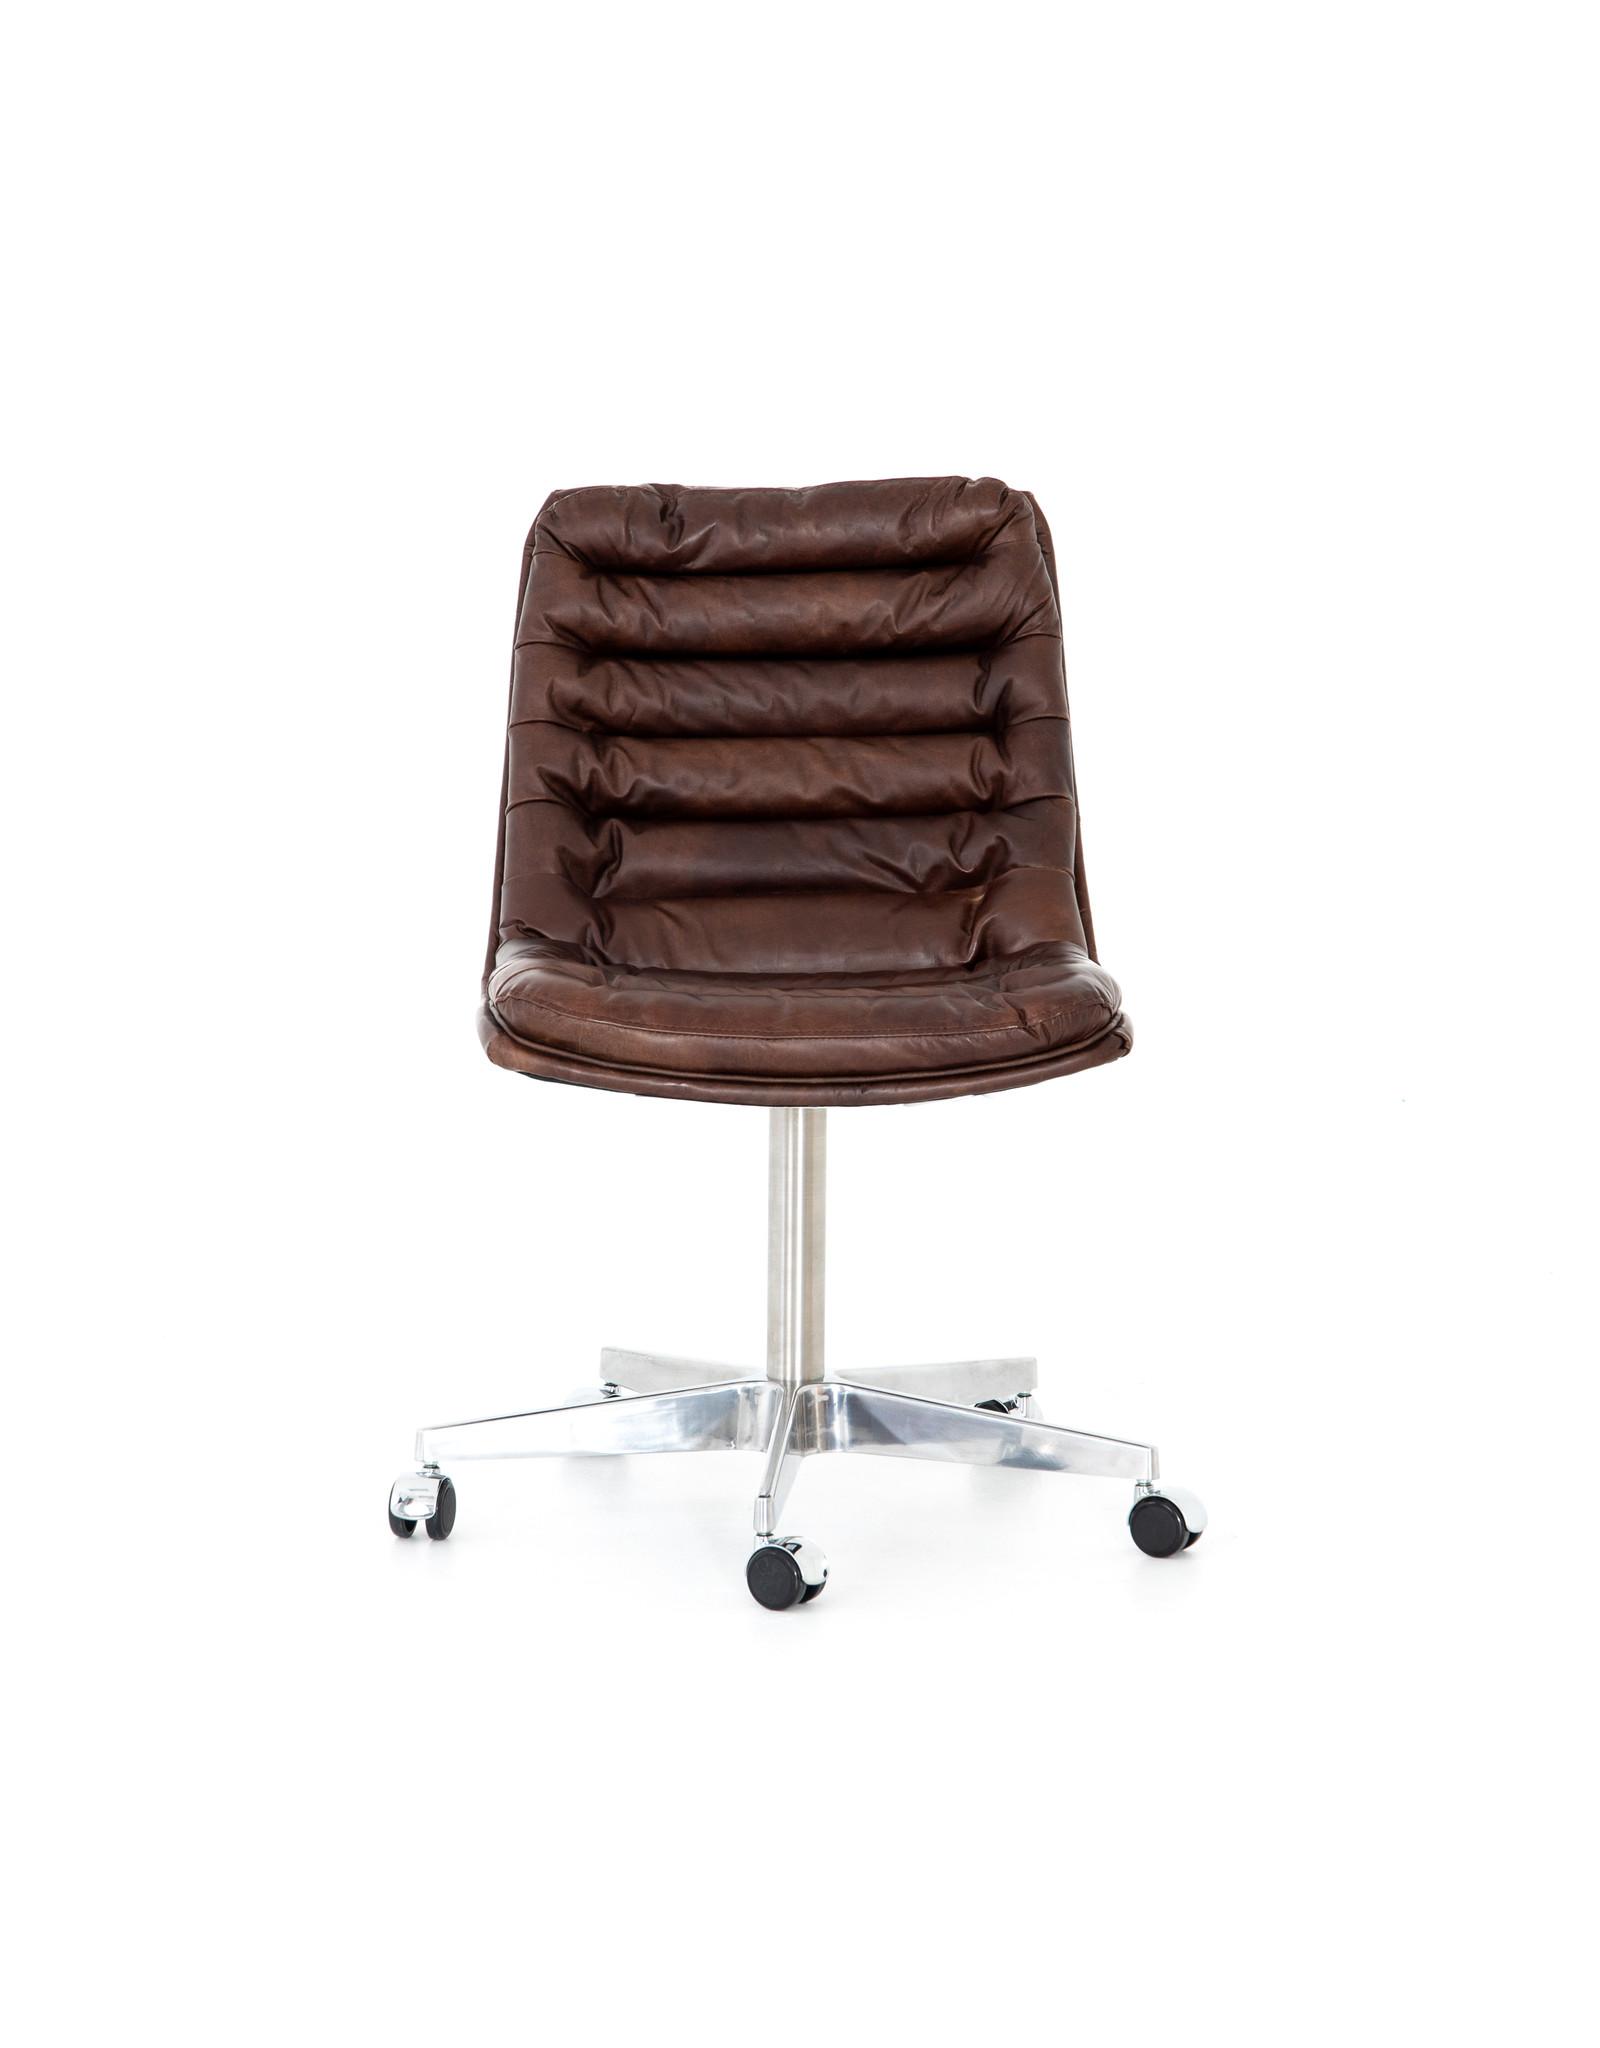 *Malibu Desk Chair - Antique Whiskey